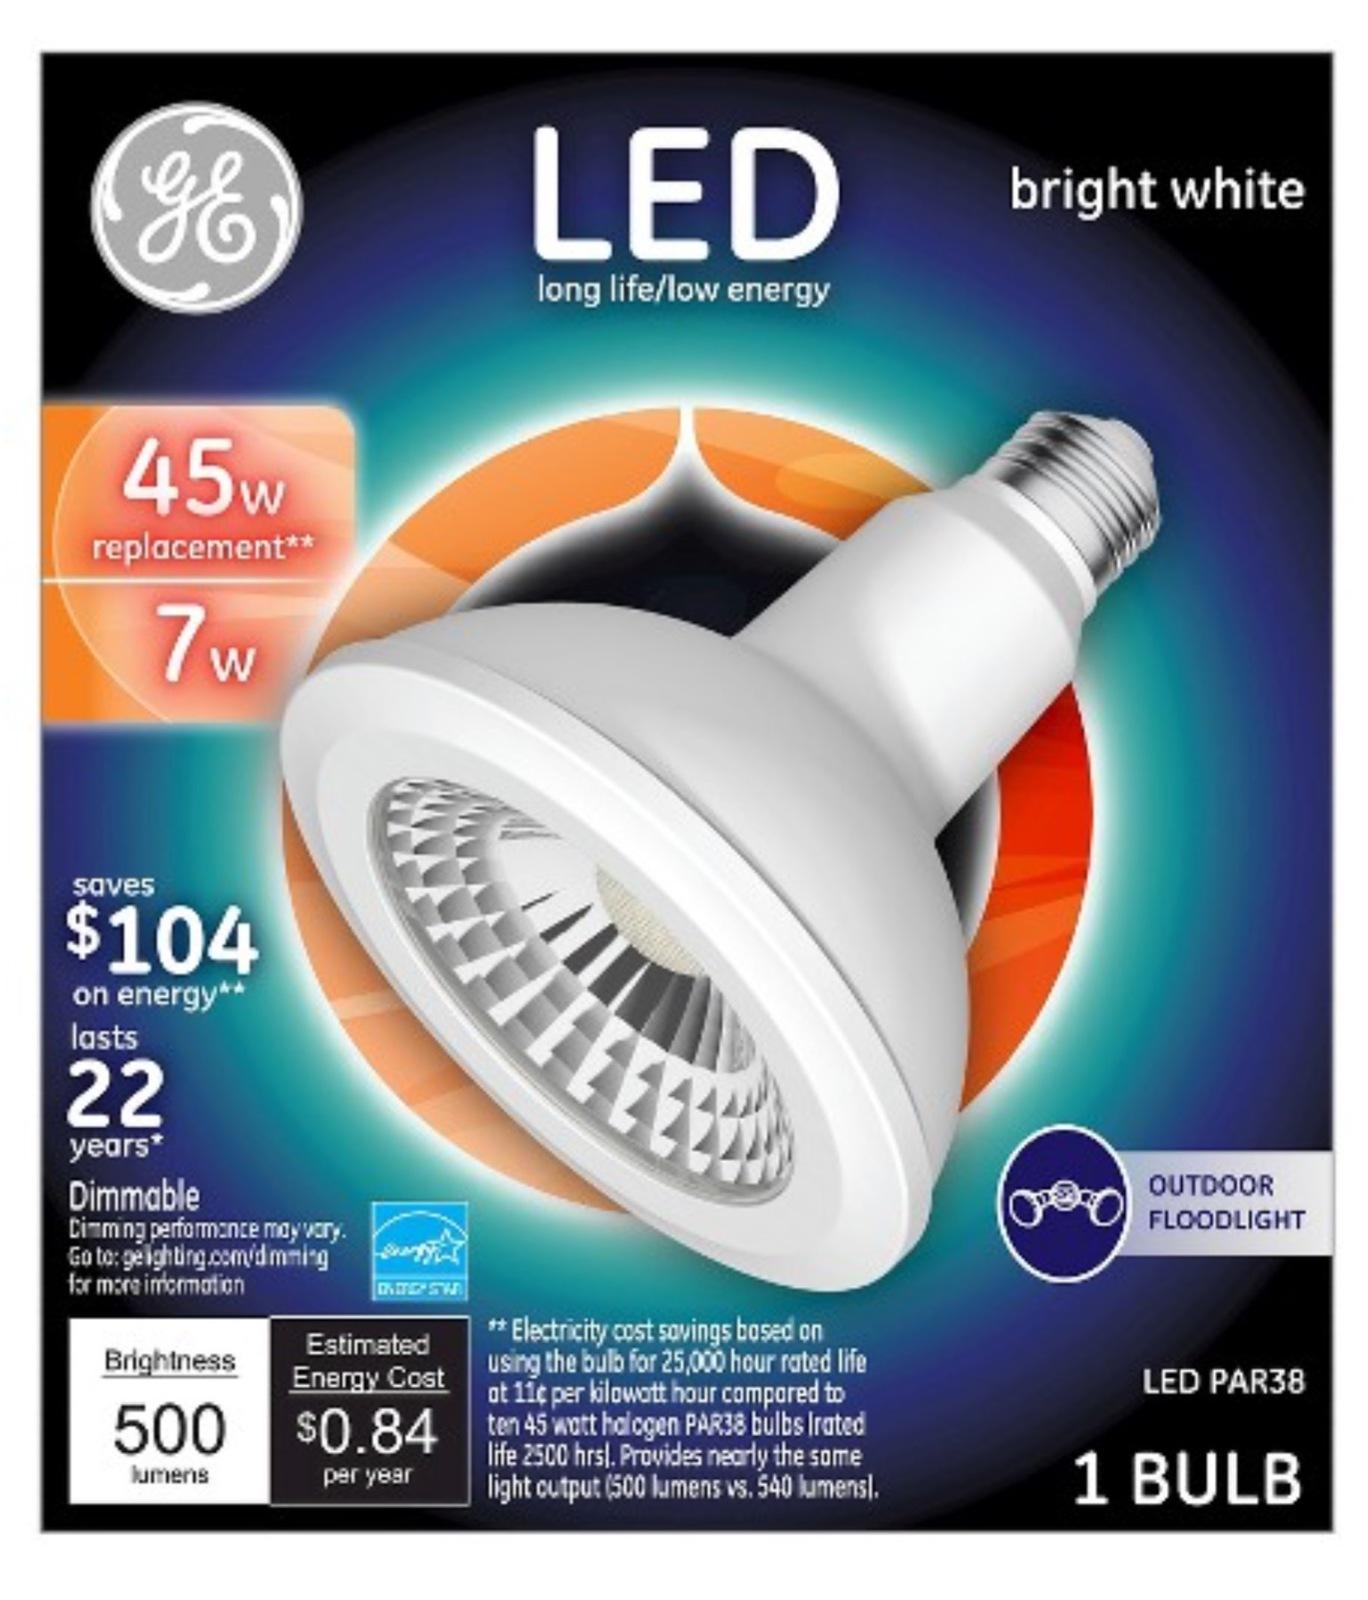 GE LED PAR38 Bright White 45W Dimmable Light Bulb (3000K) uses 7W (2 Bulb)  - $25.98